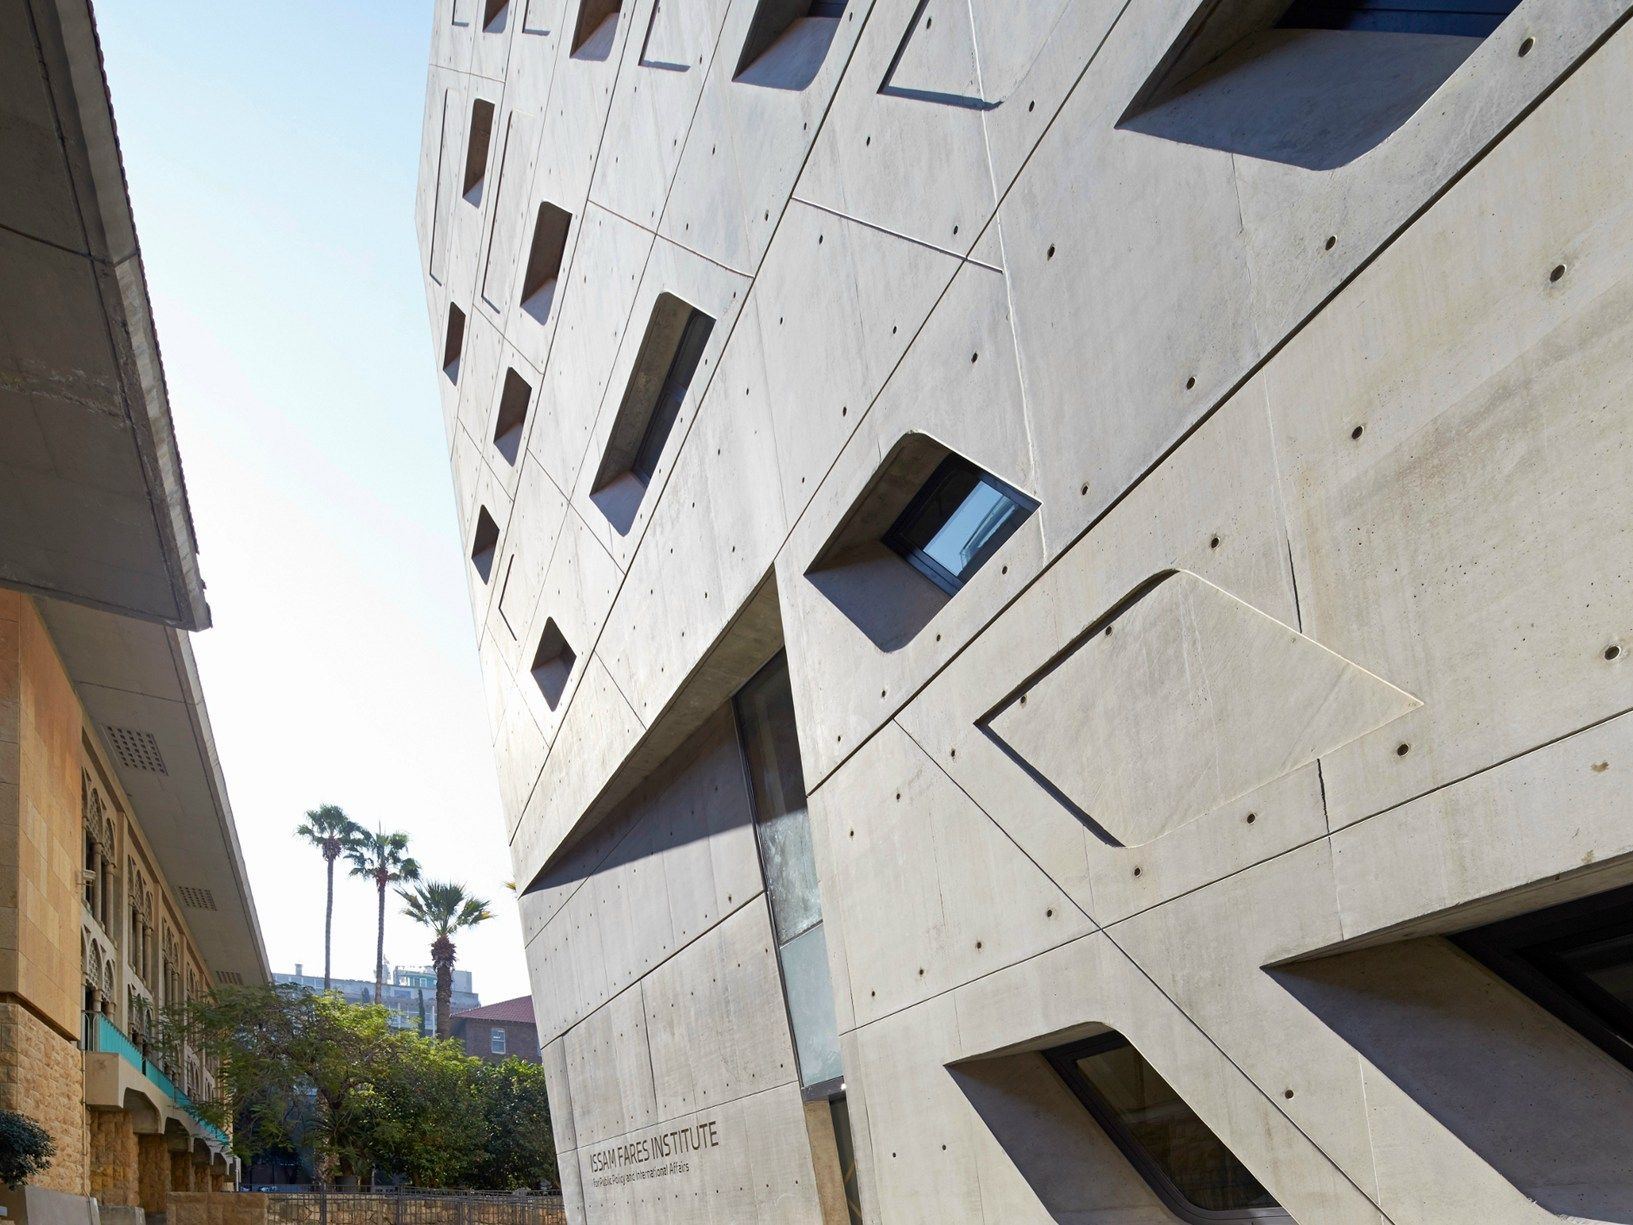 Zaha Hadid completa l'Issam Fares Institute a Beirut